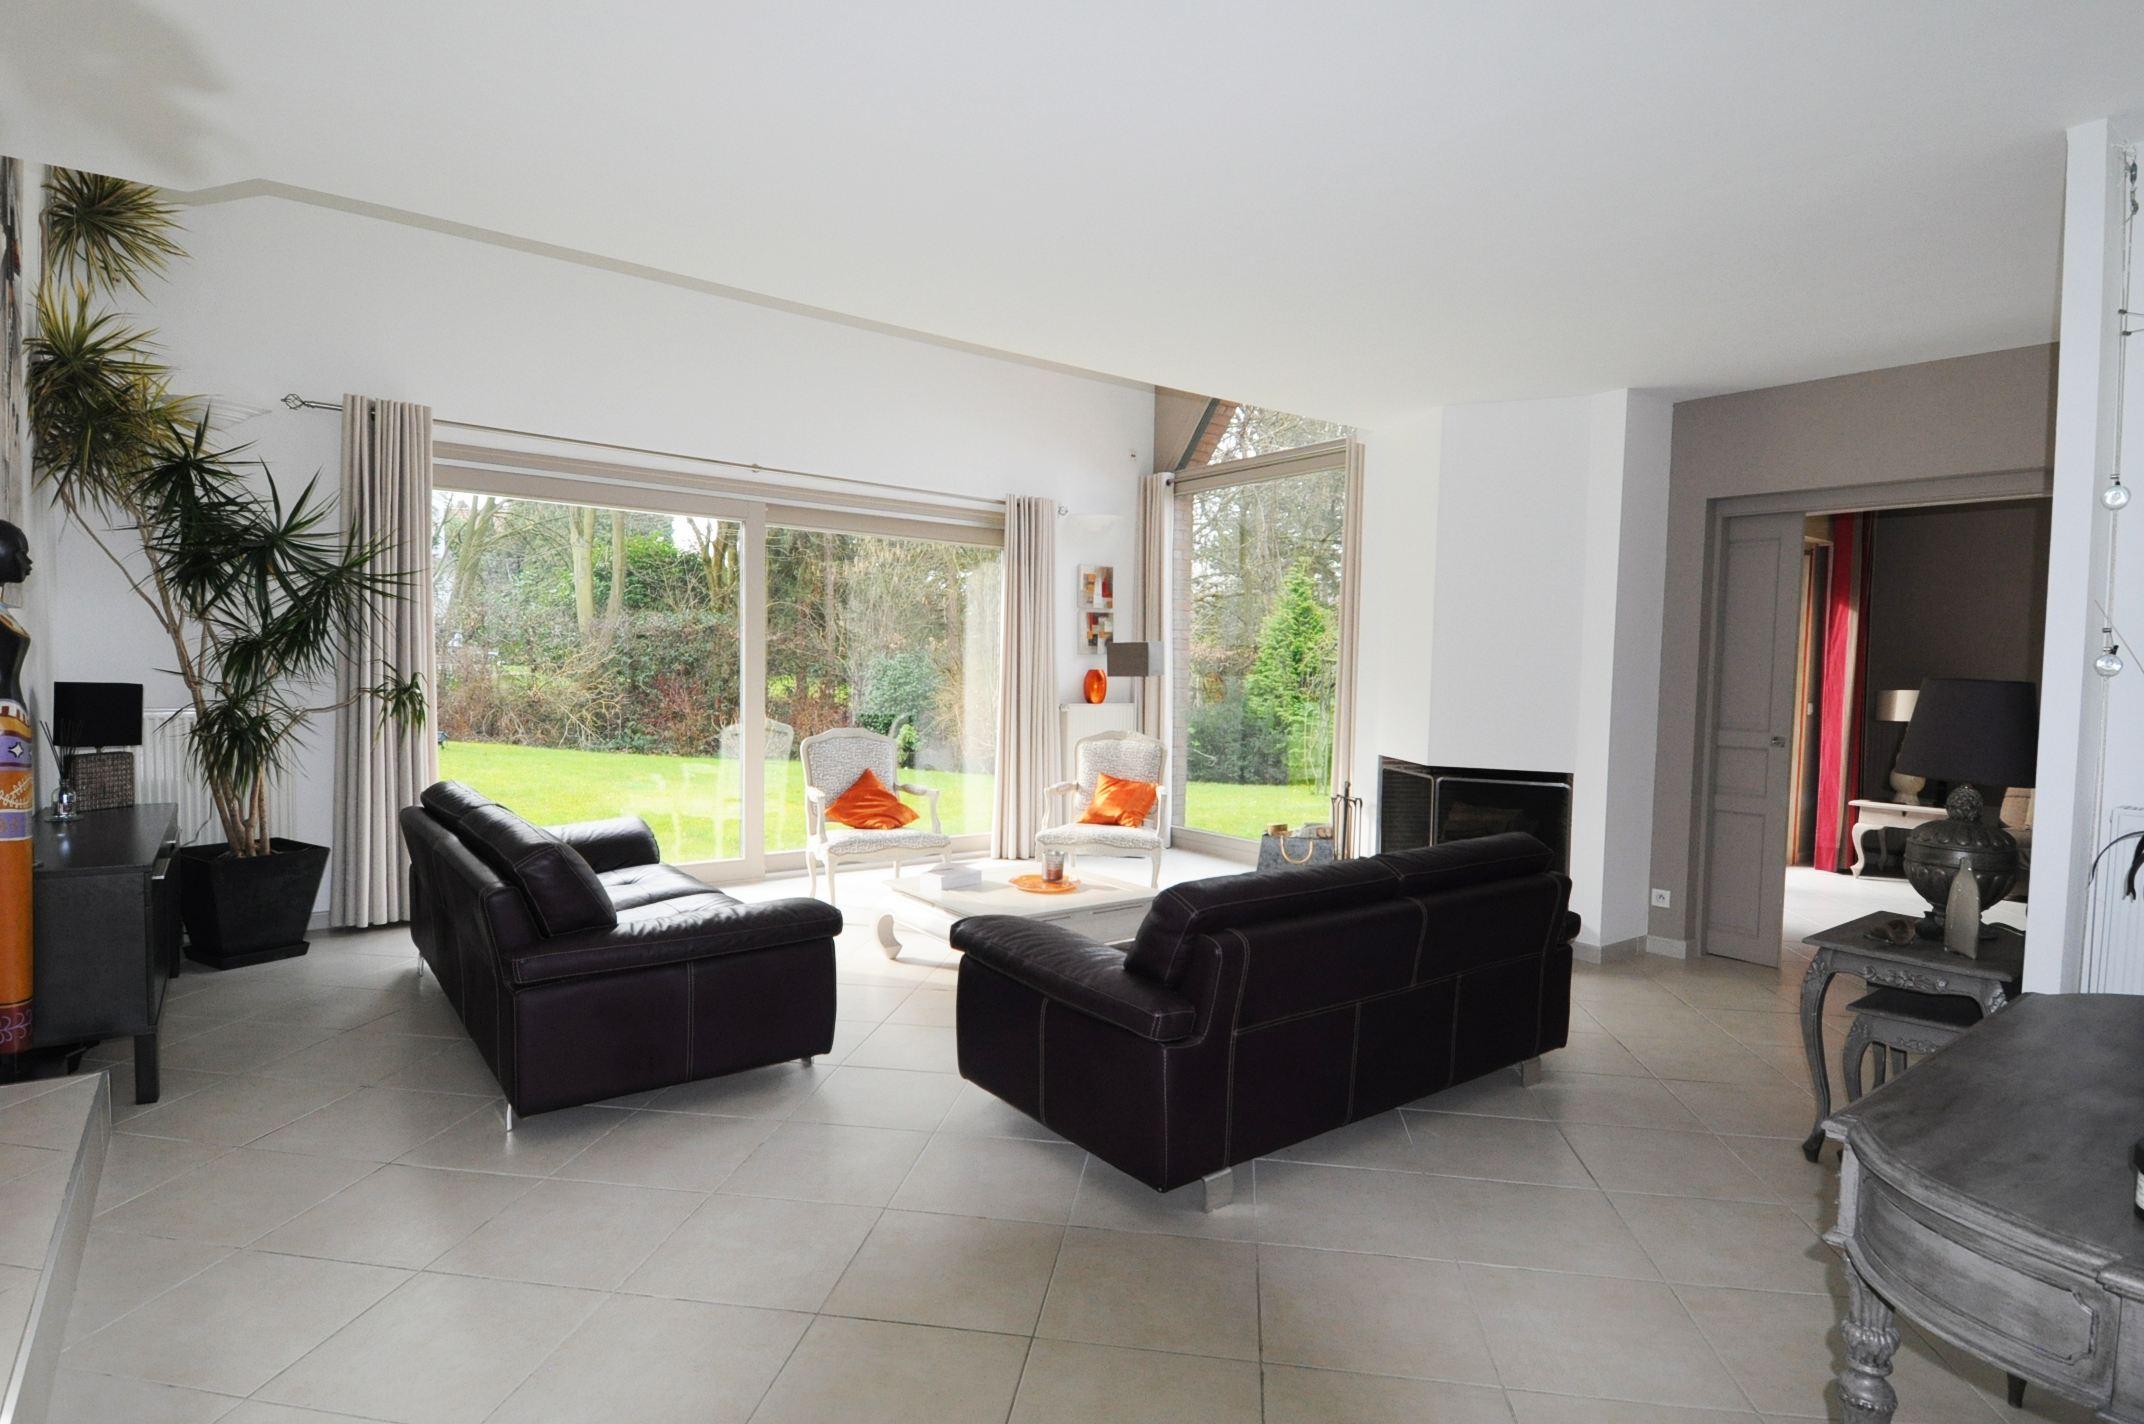 sales property at CROIX-BEAUMONT, in private area, 281sqm designer villa. 6 Br.